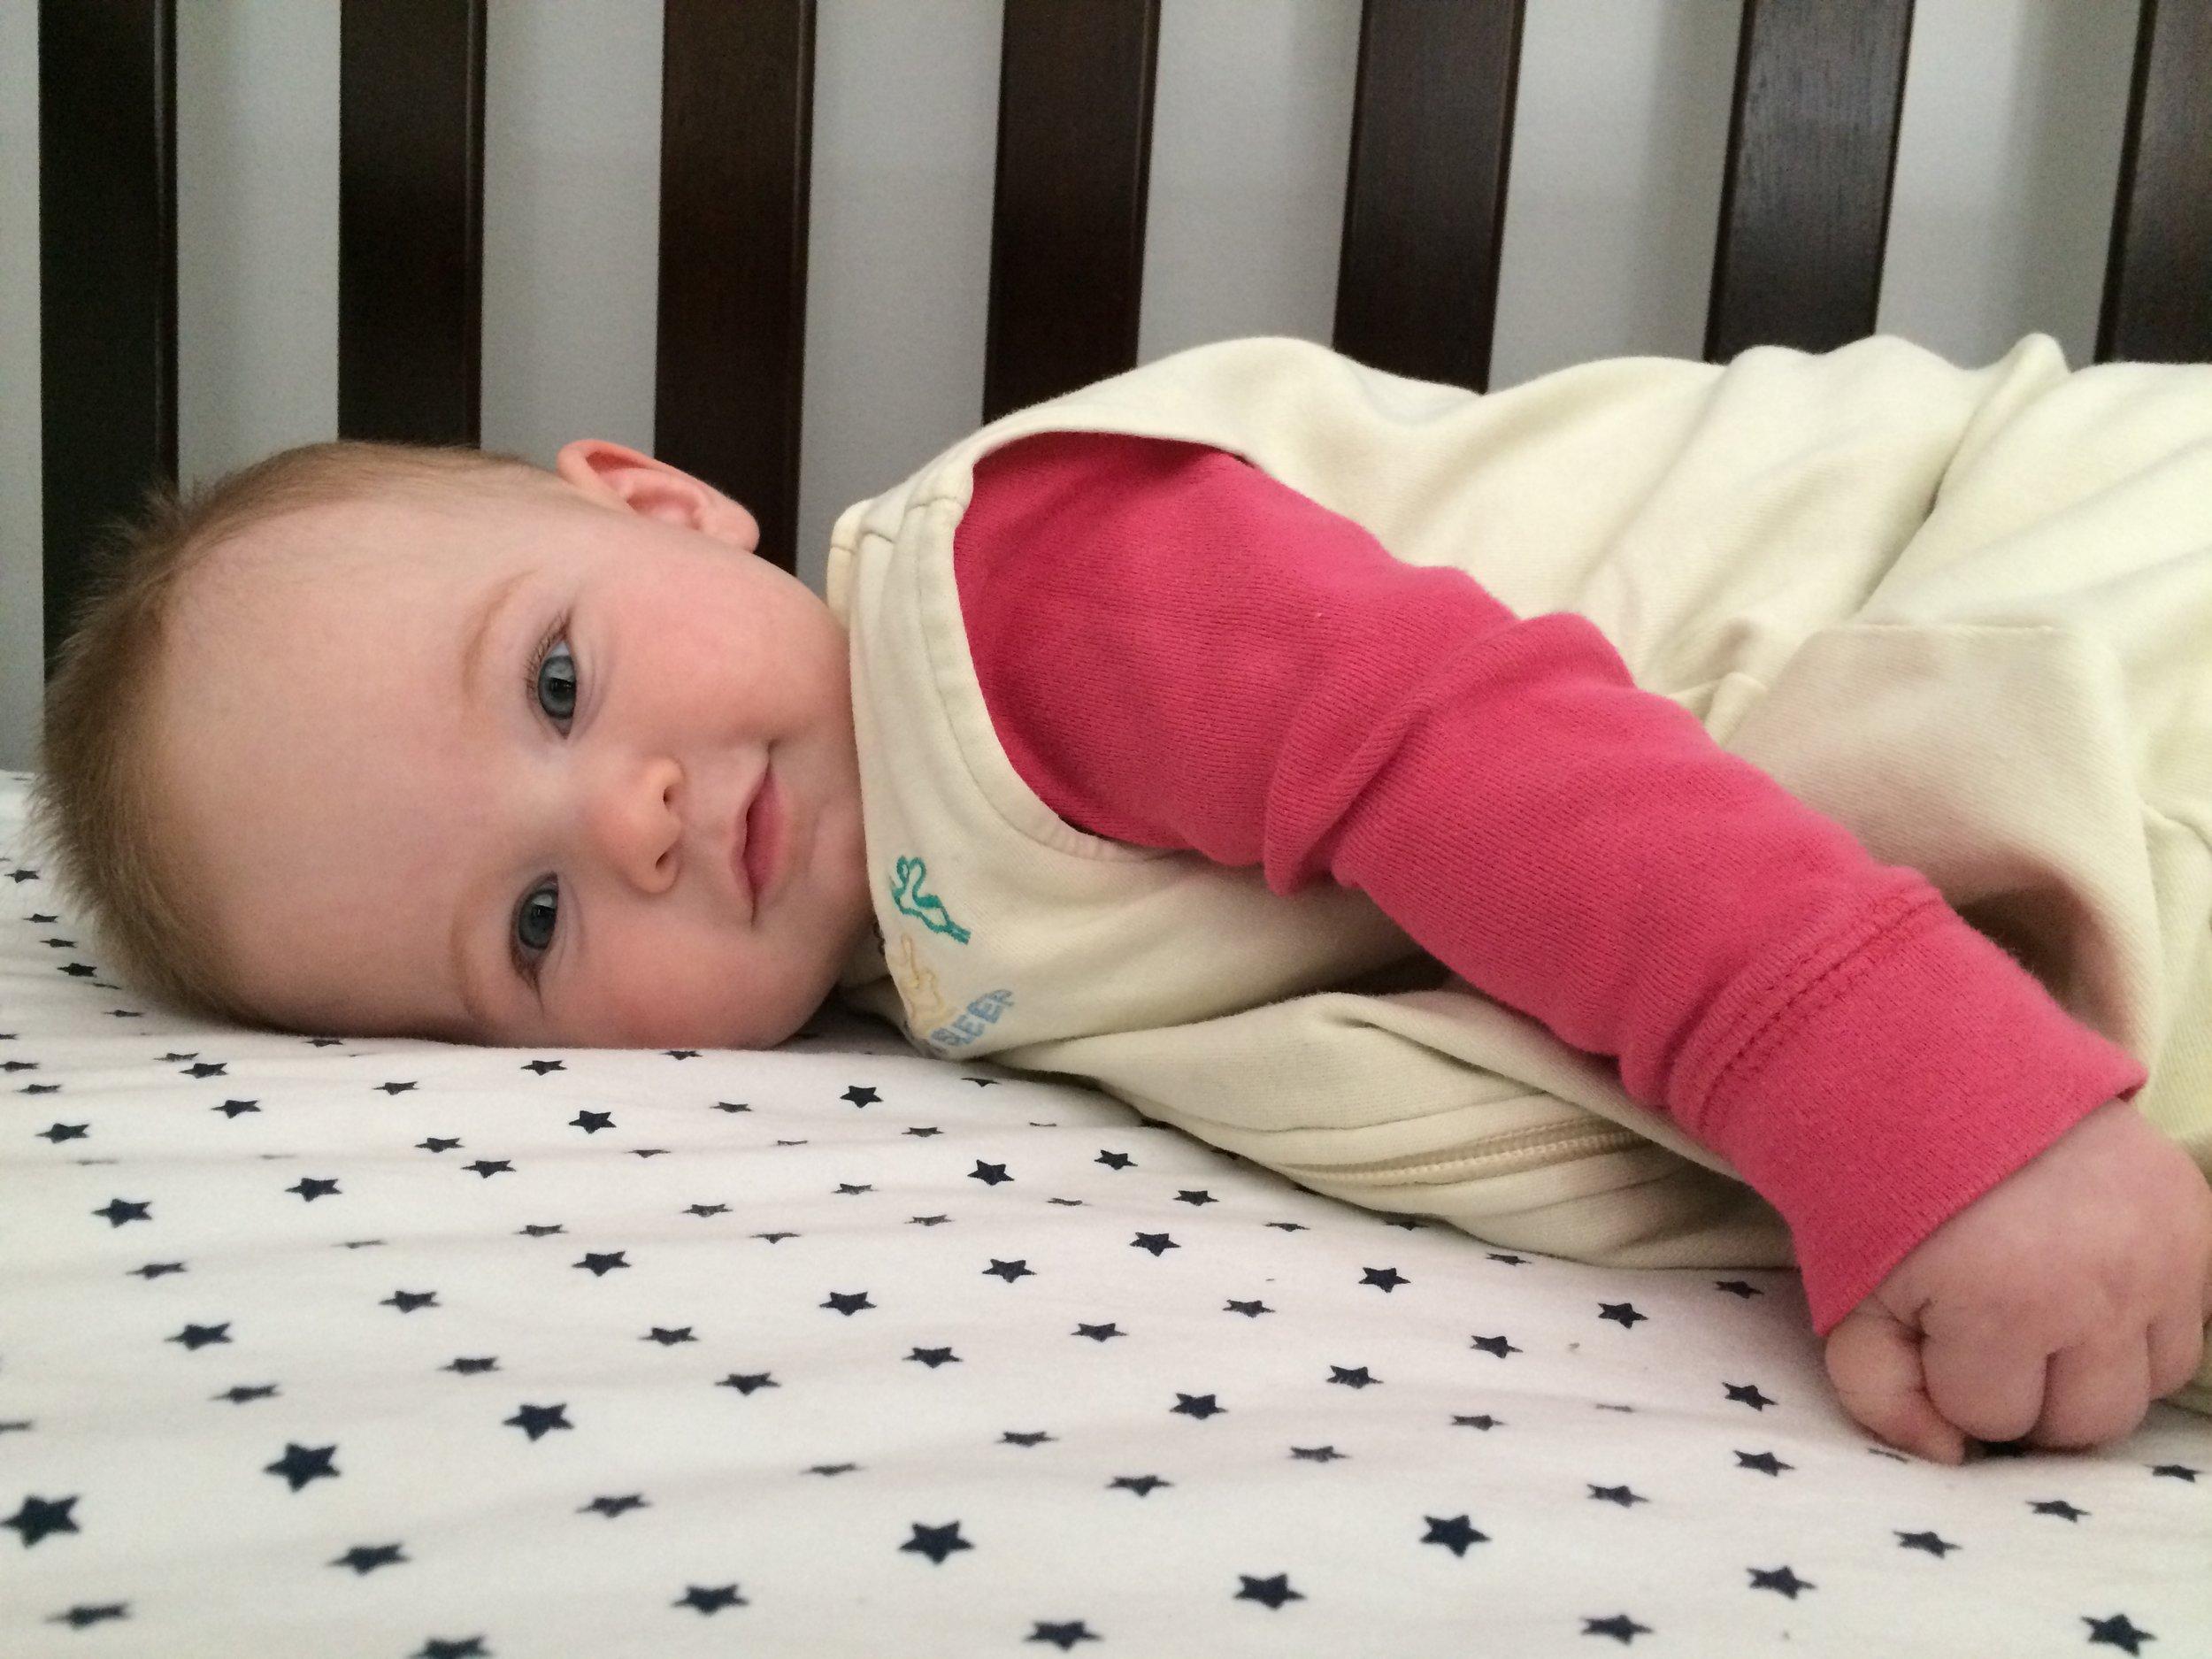 My baby soooo cute! - …especially after a REAL nap.